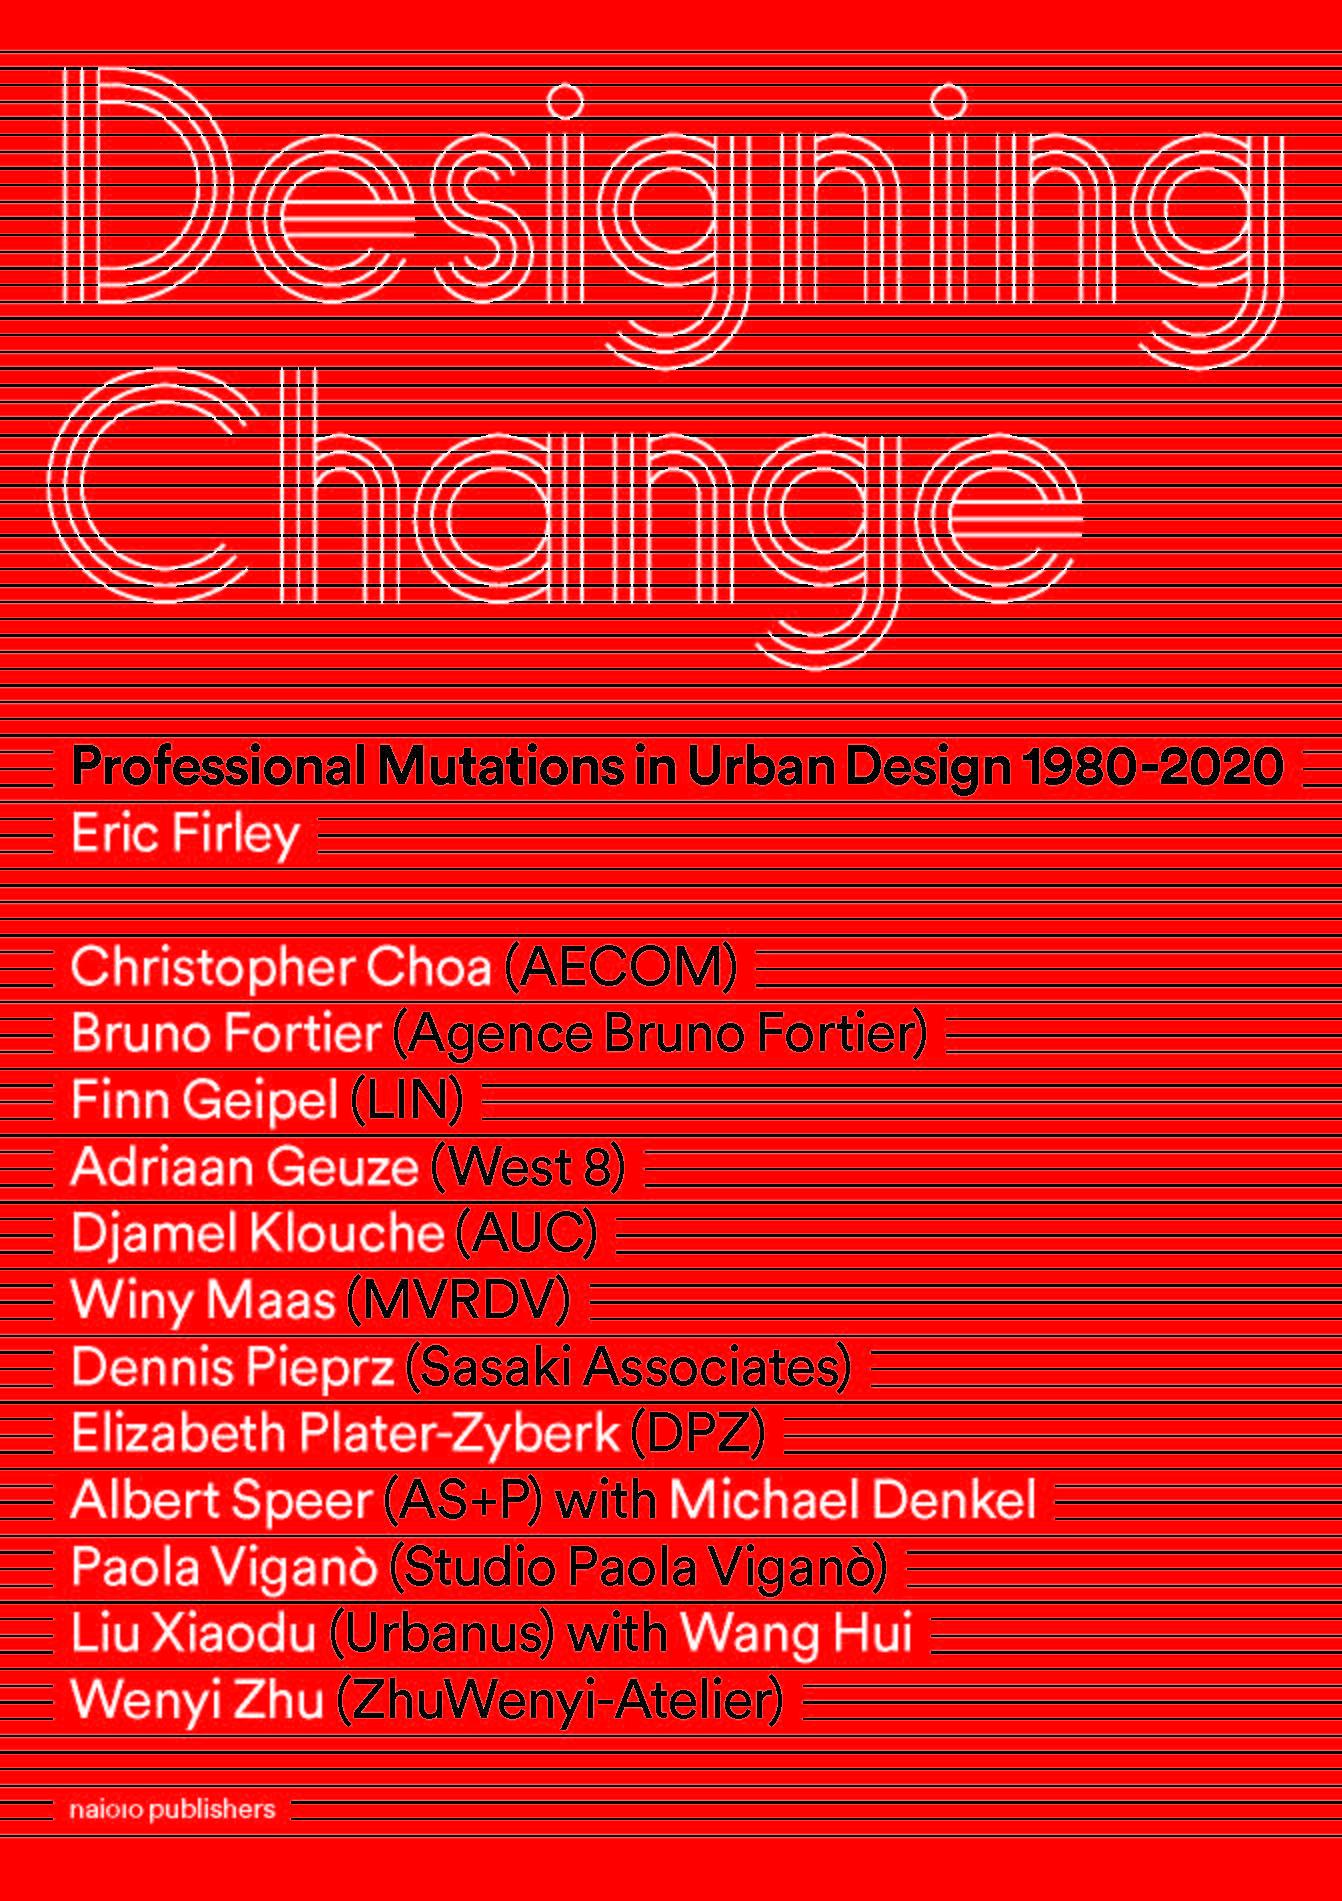 DesigningChange-cover